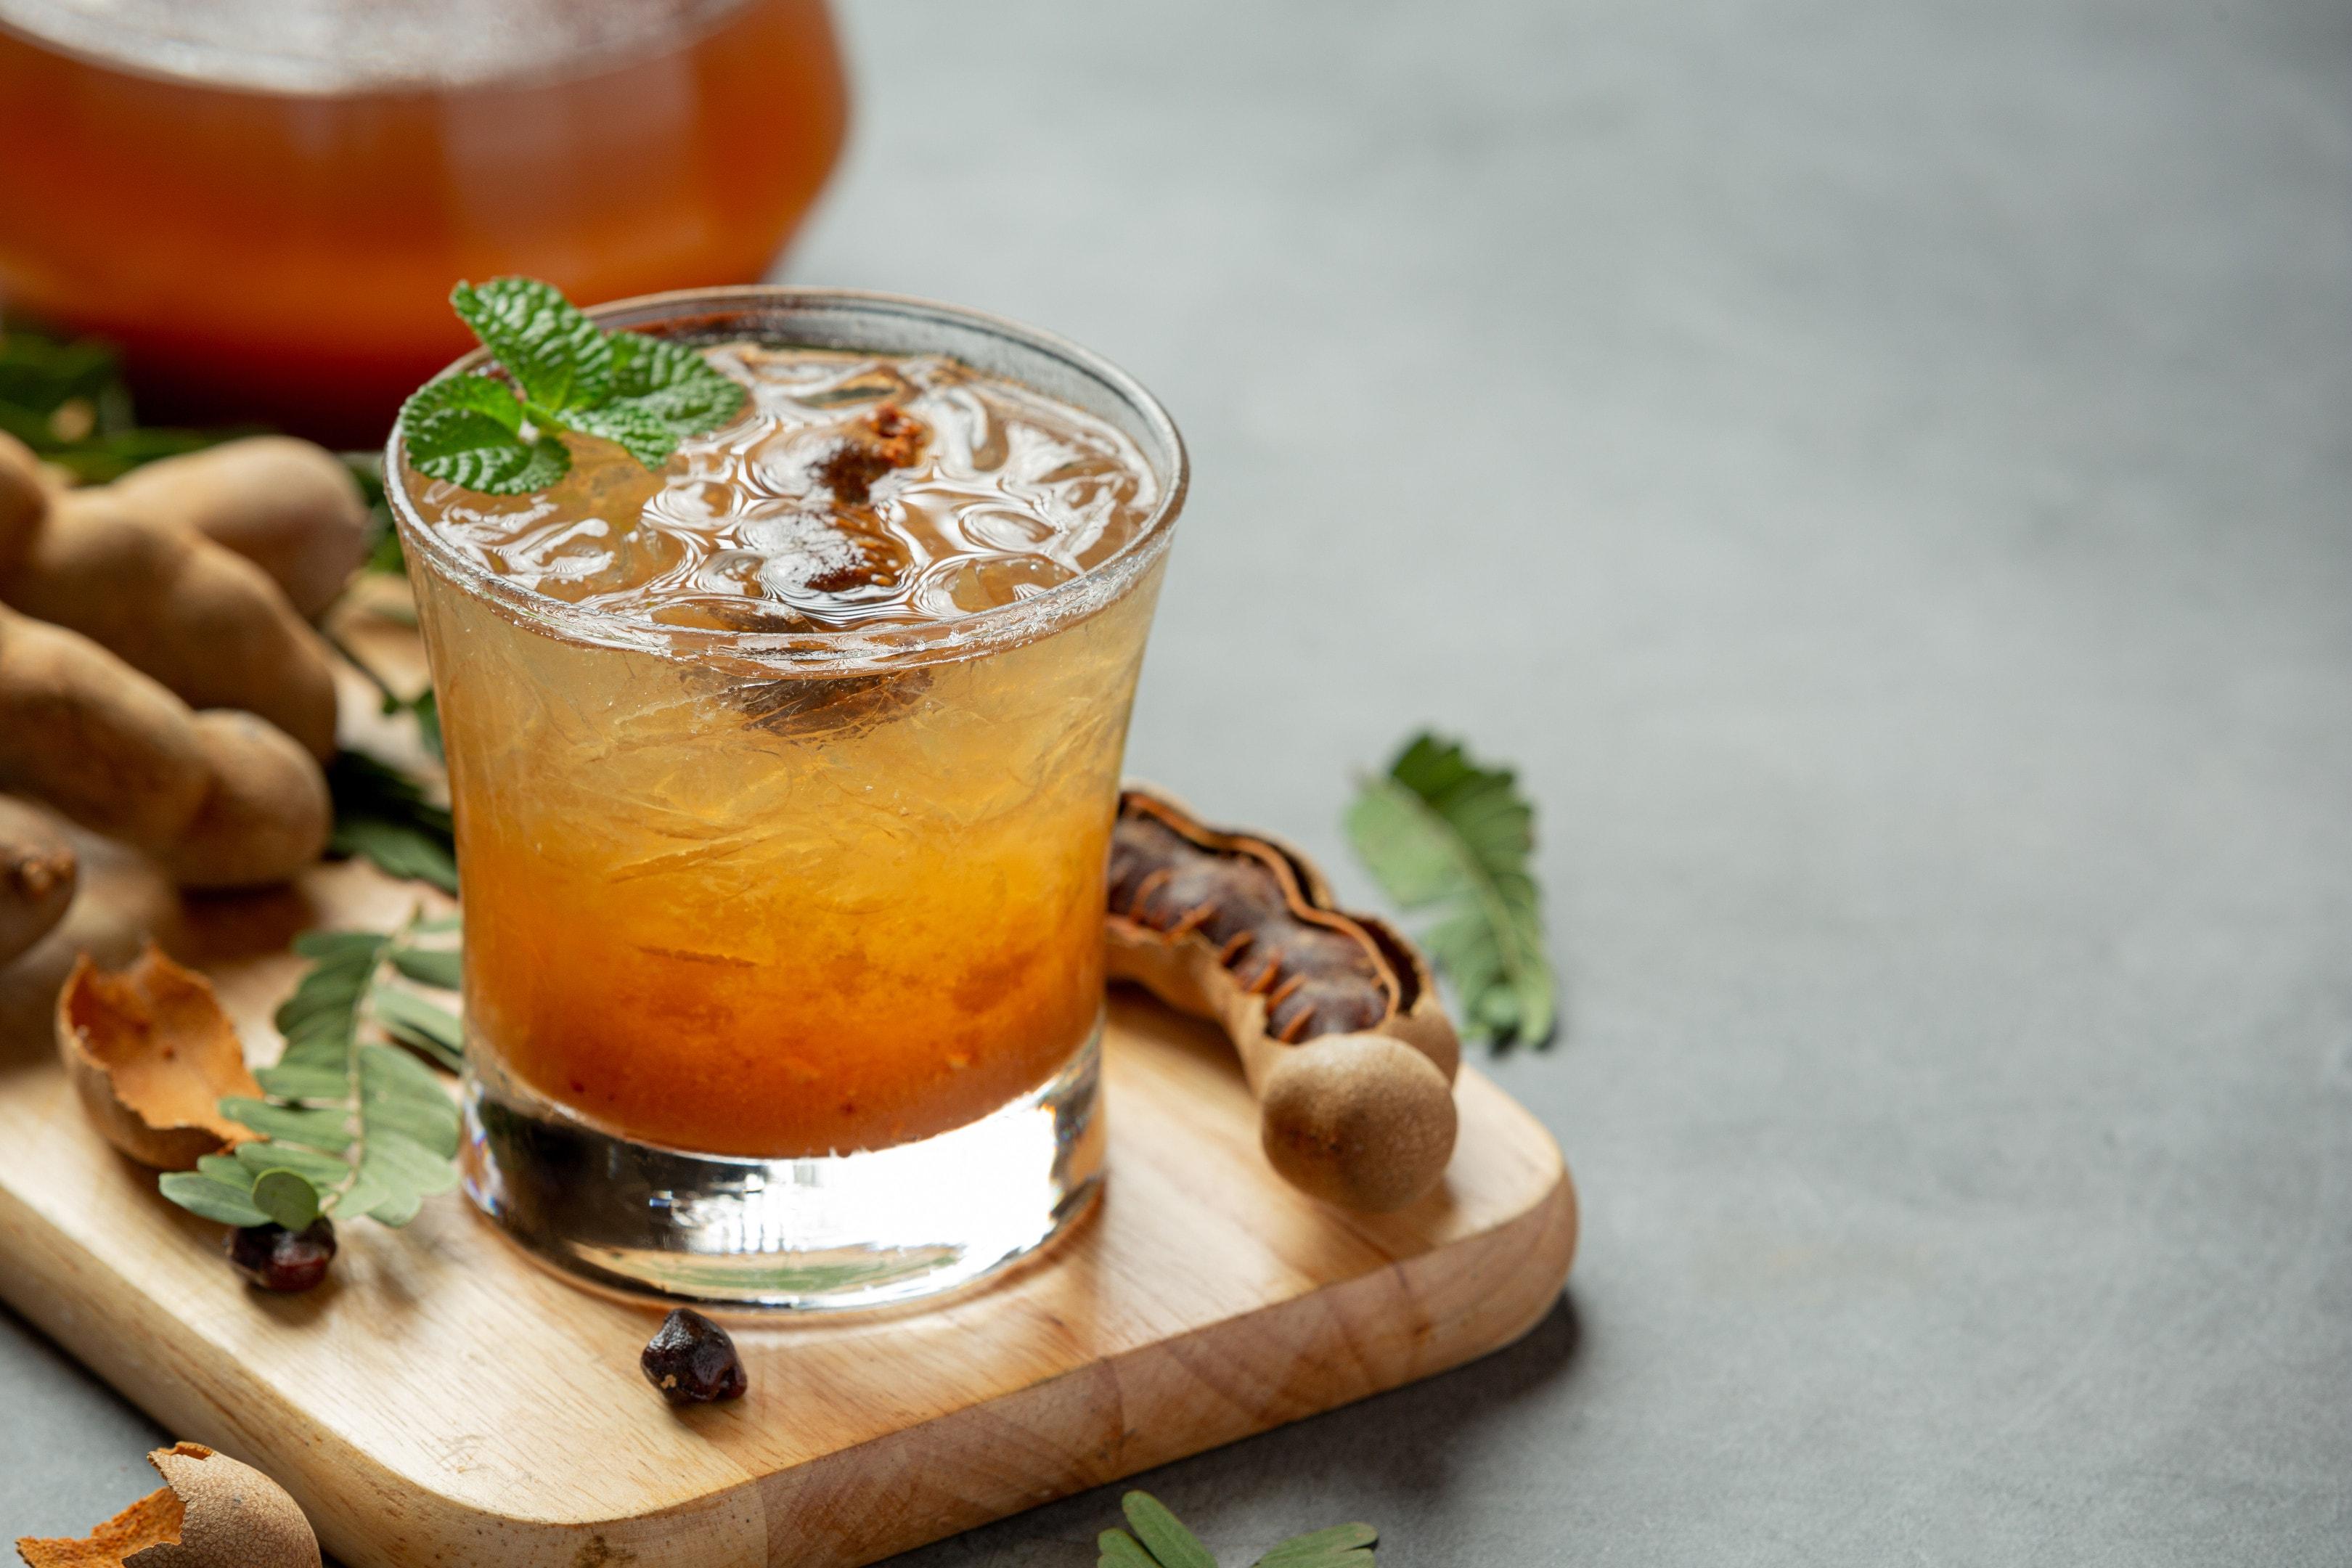 Delicious sweet tamarind drink